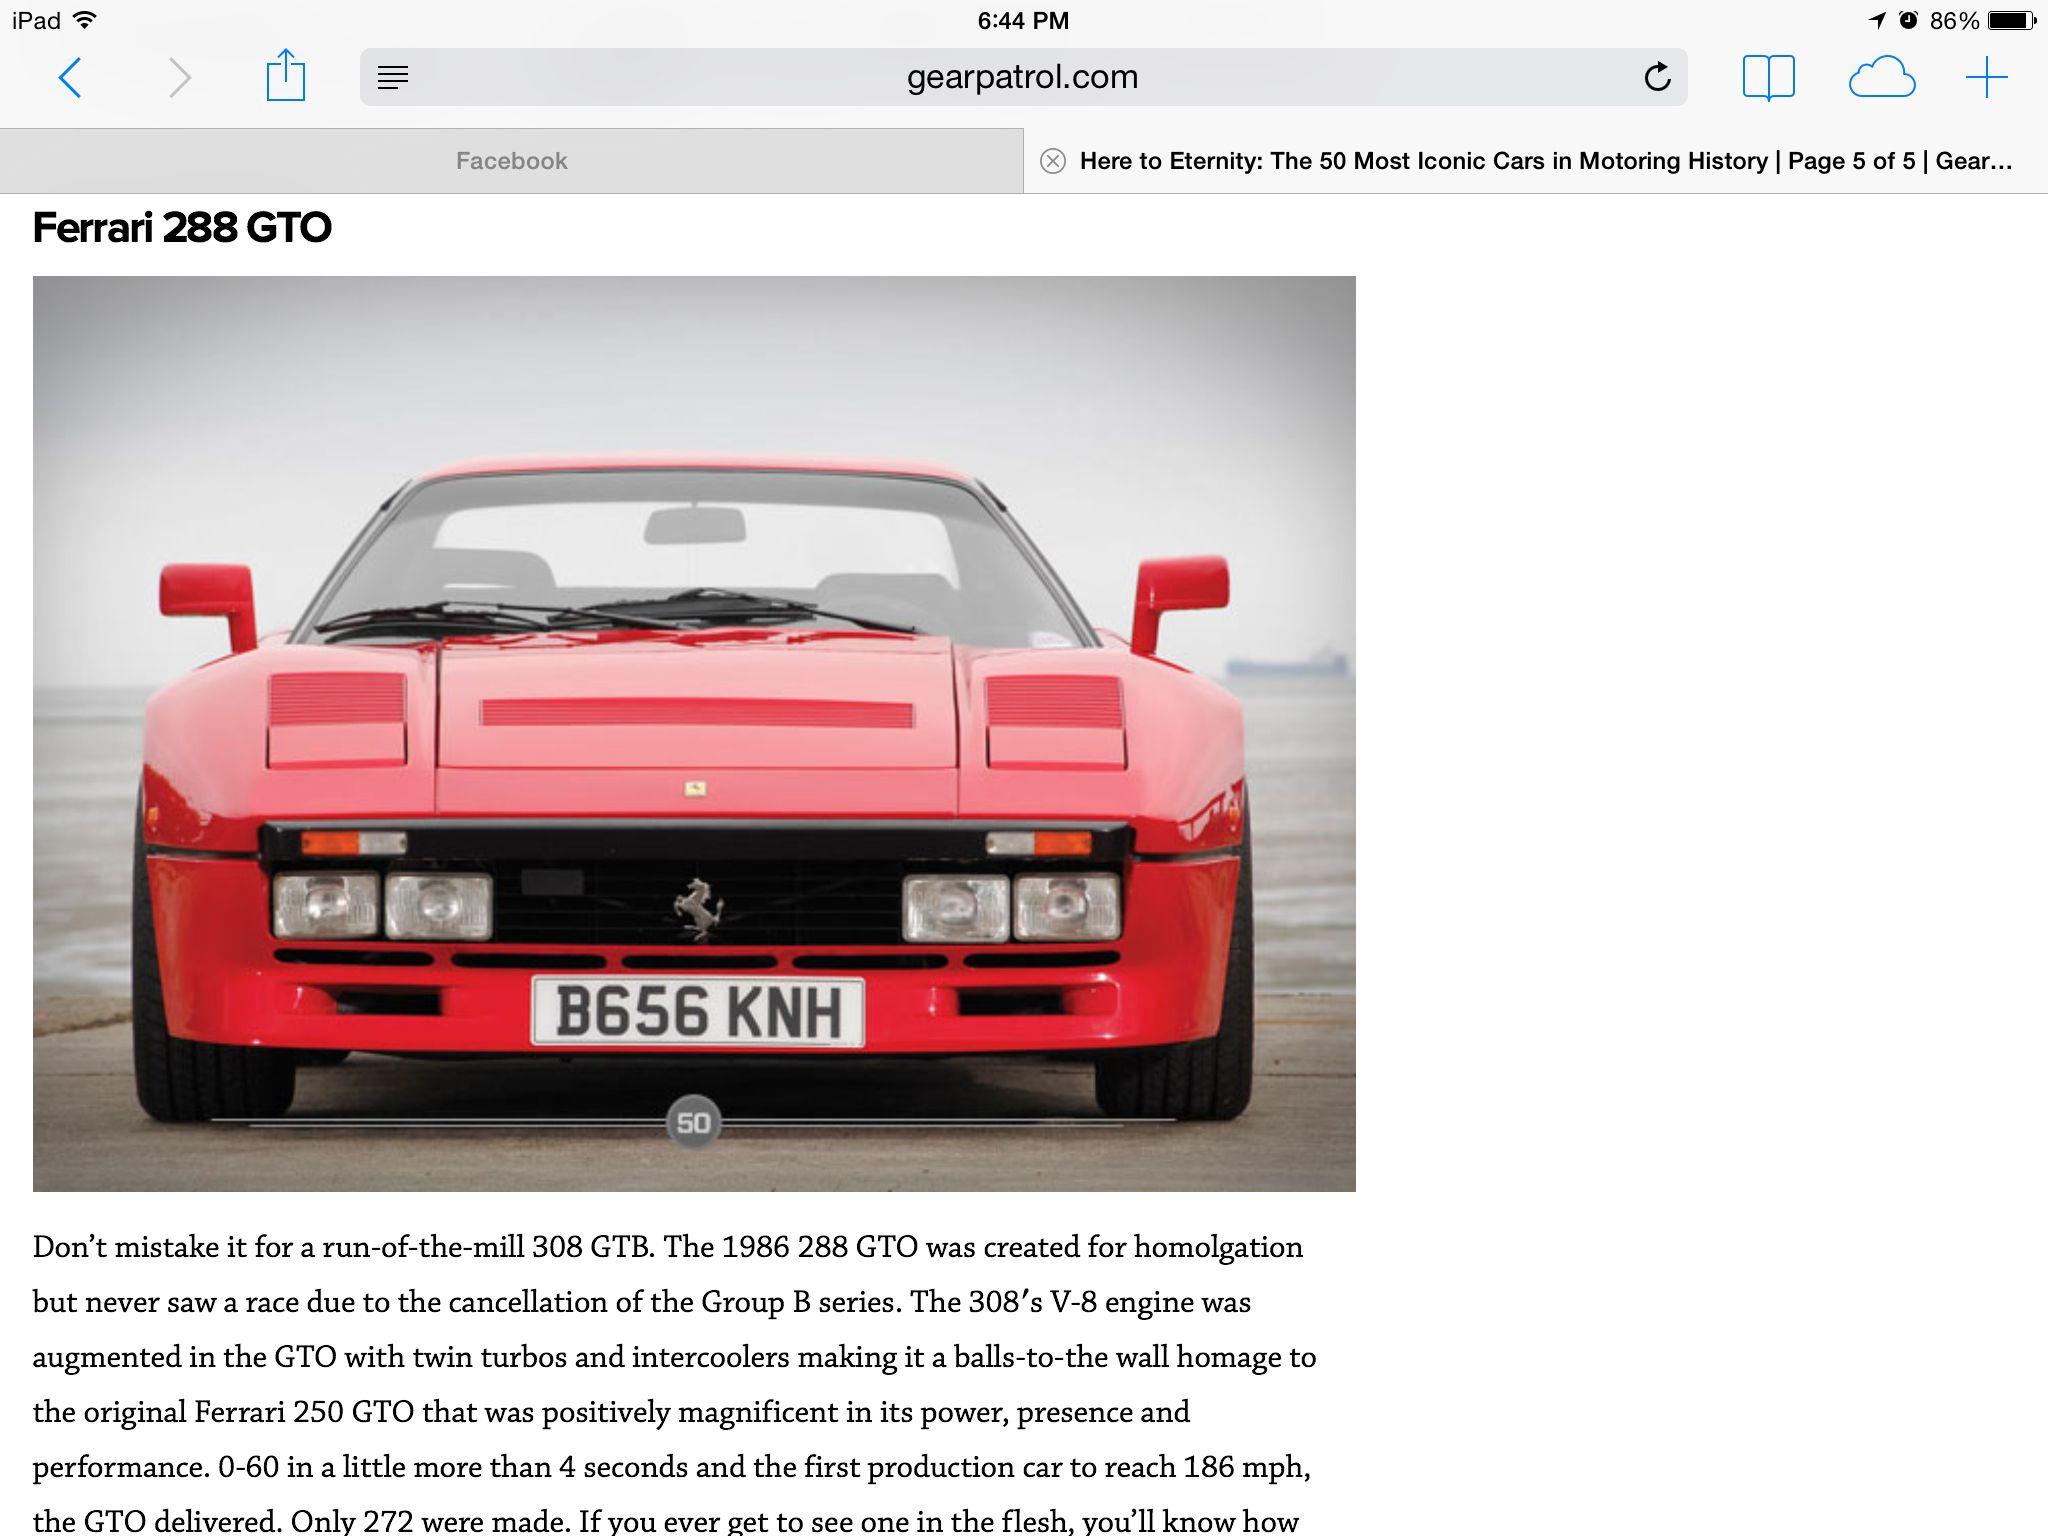 pin by j rott on international icons top 50 ferrari 288 gto ferrari classic car show pinterest